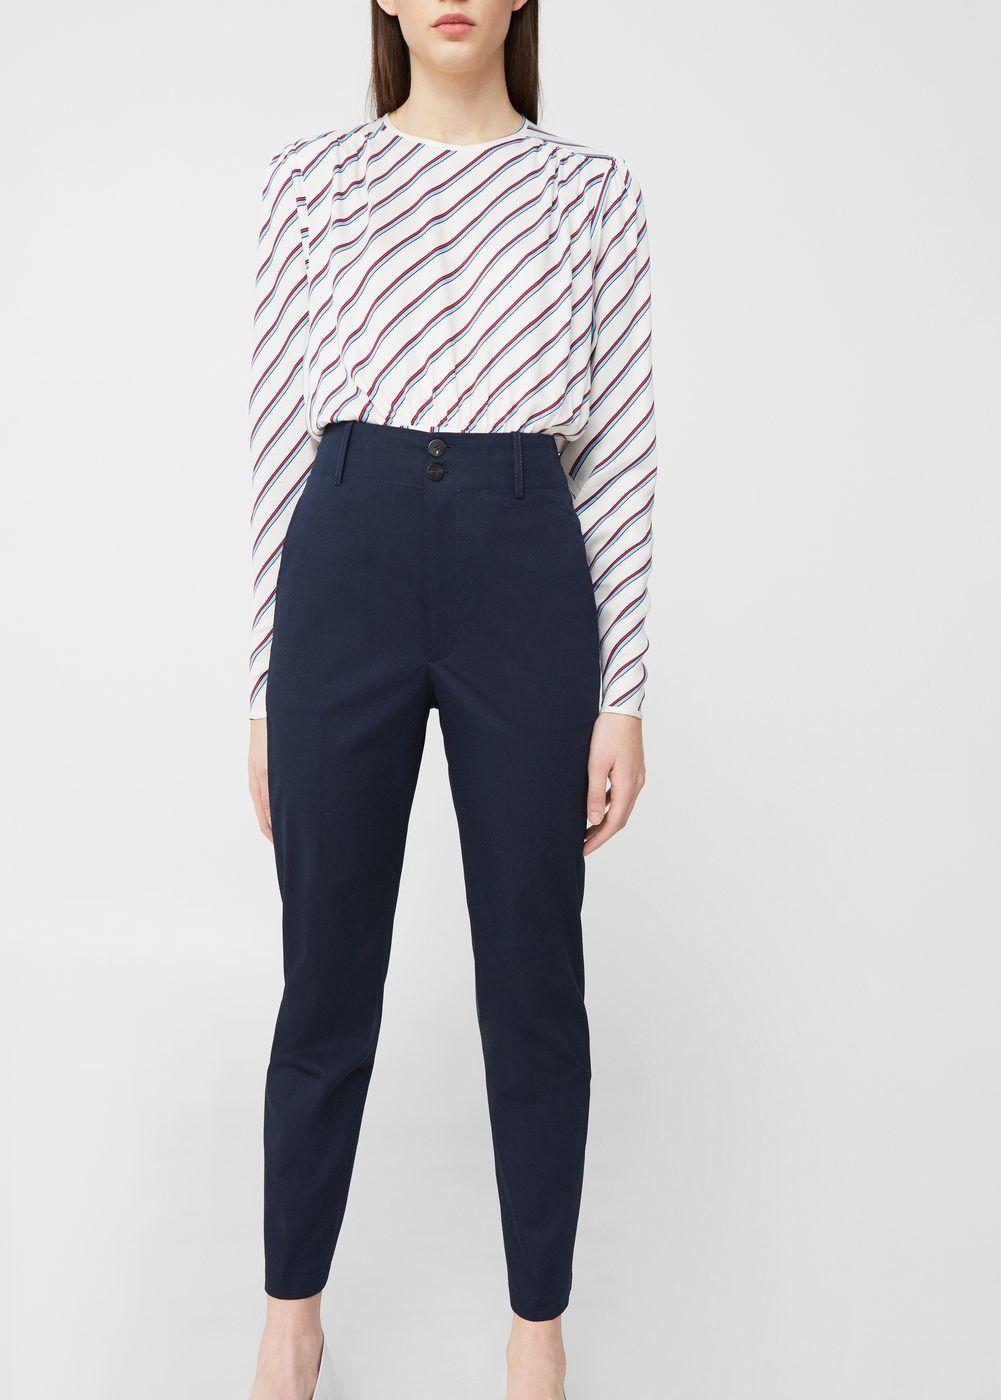 b7b3bf0acf Pantalón algodón tiro alto - Pantalones de Mujer